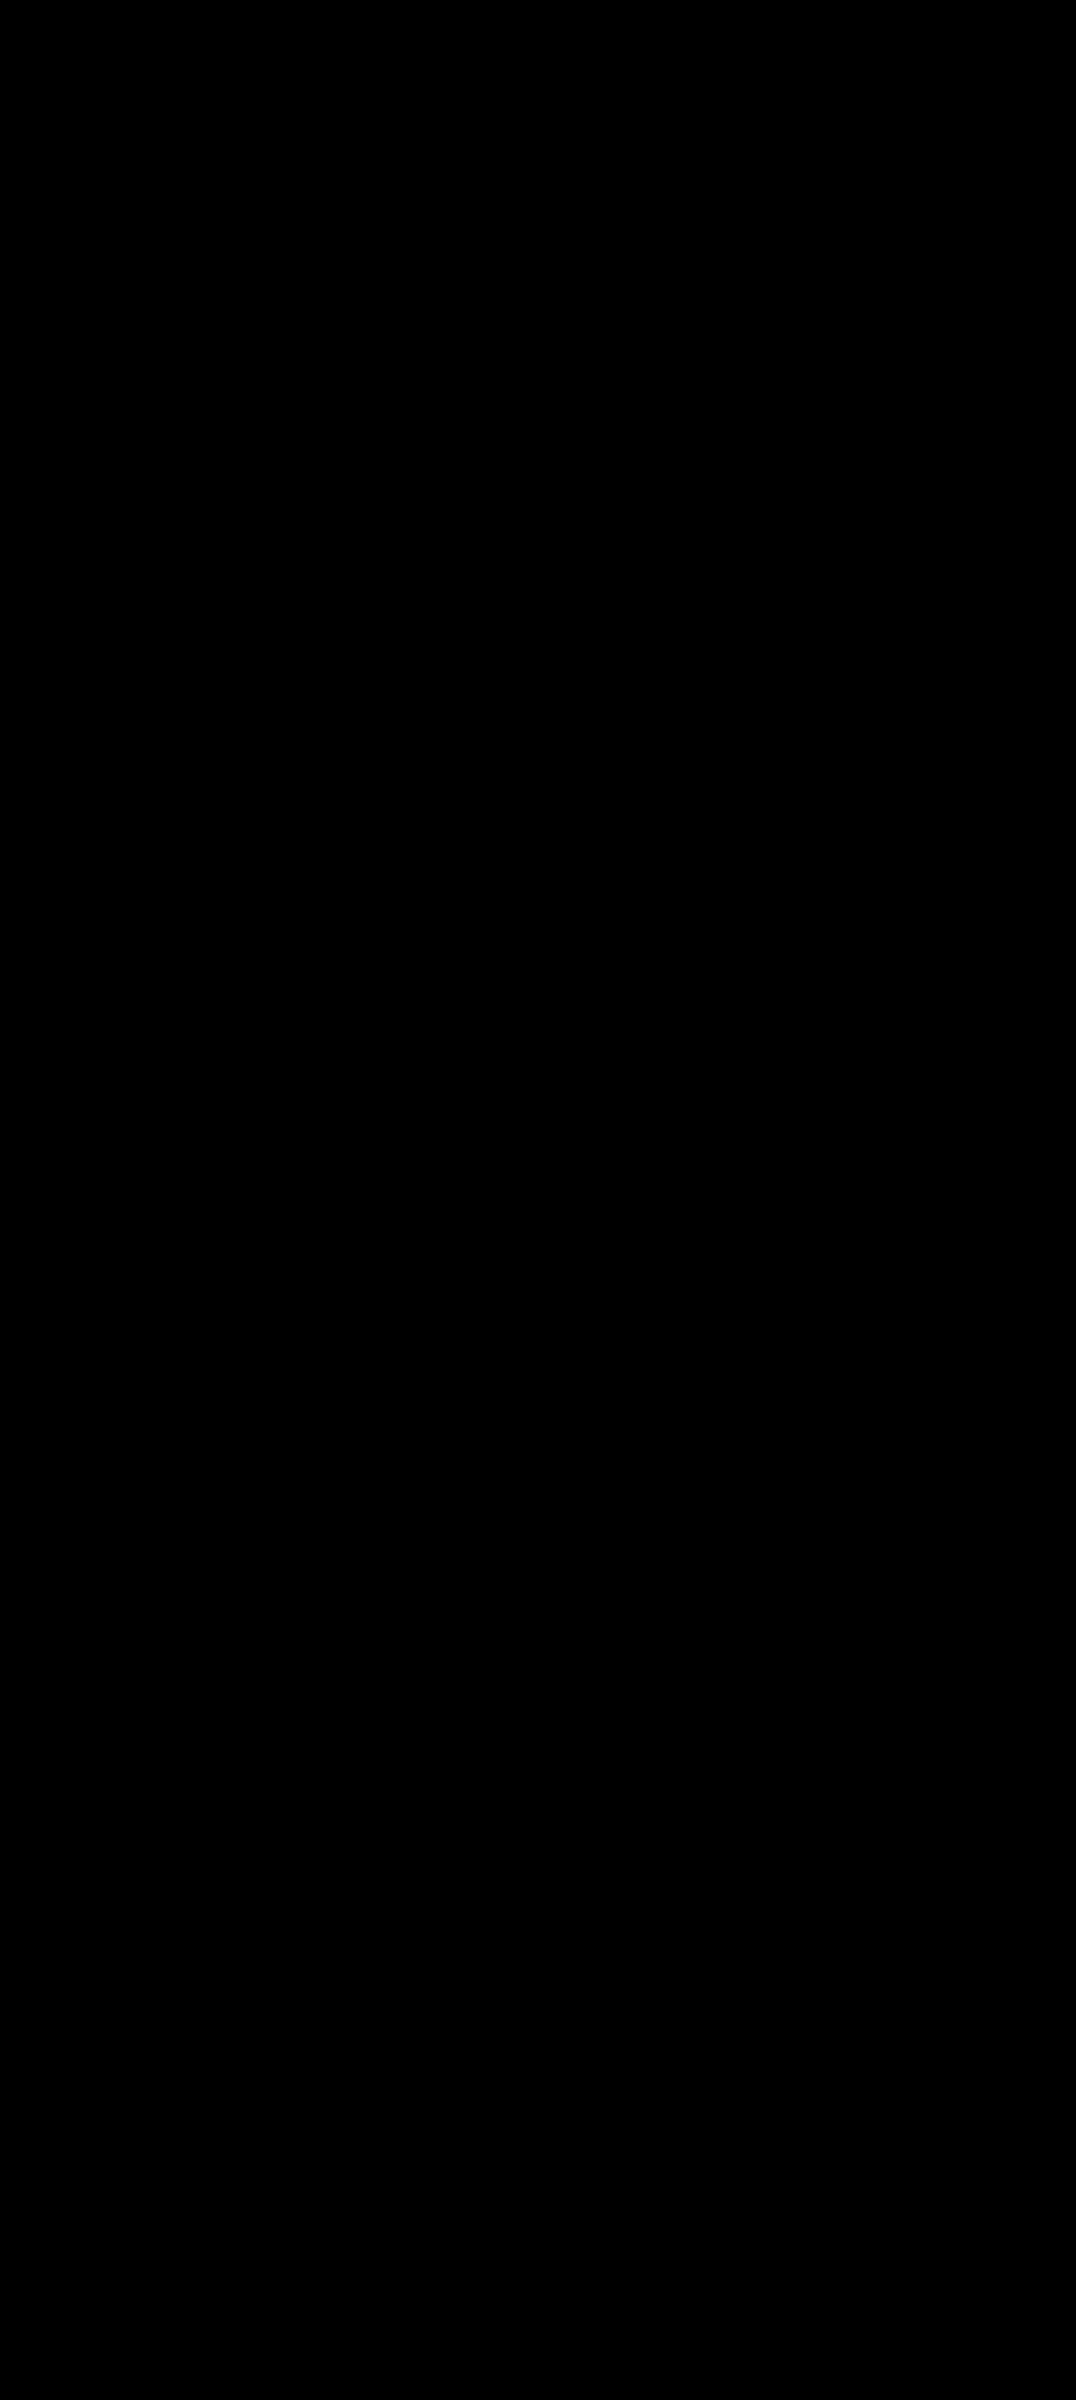 Steampunk clipart vector. Watt oscillator big image